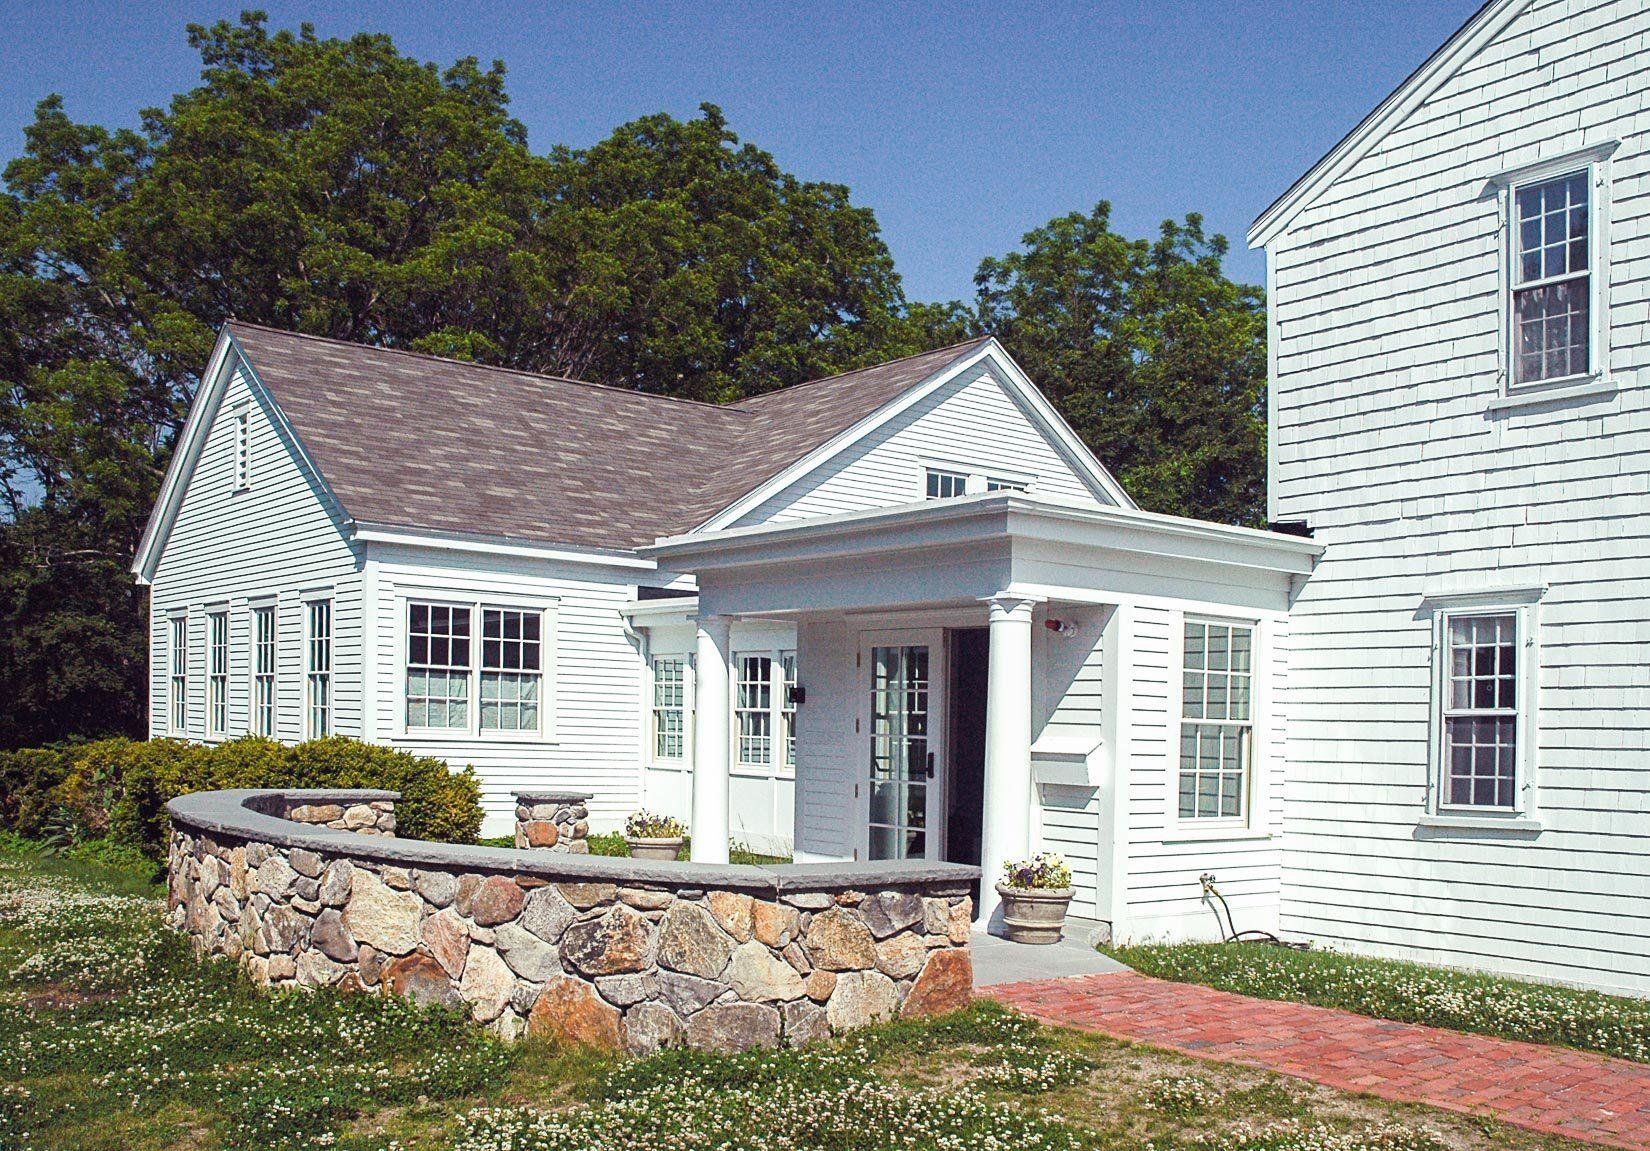 First Parish of Cohasset, Unitarian Universalist Church Fellowship Hall, Exterior view